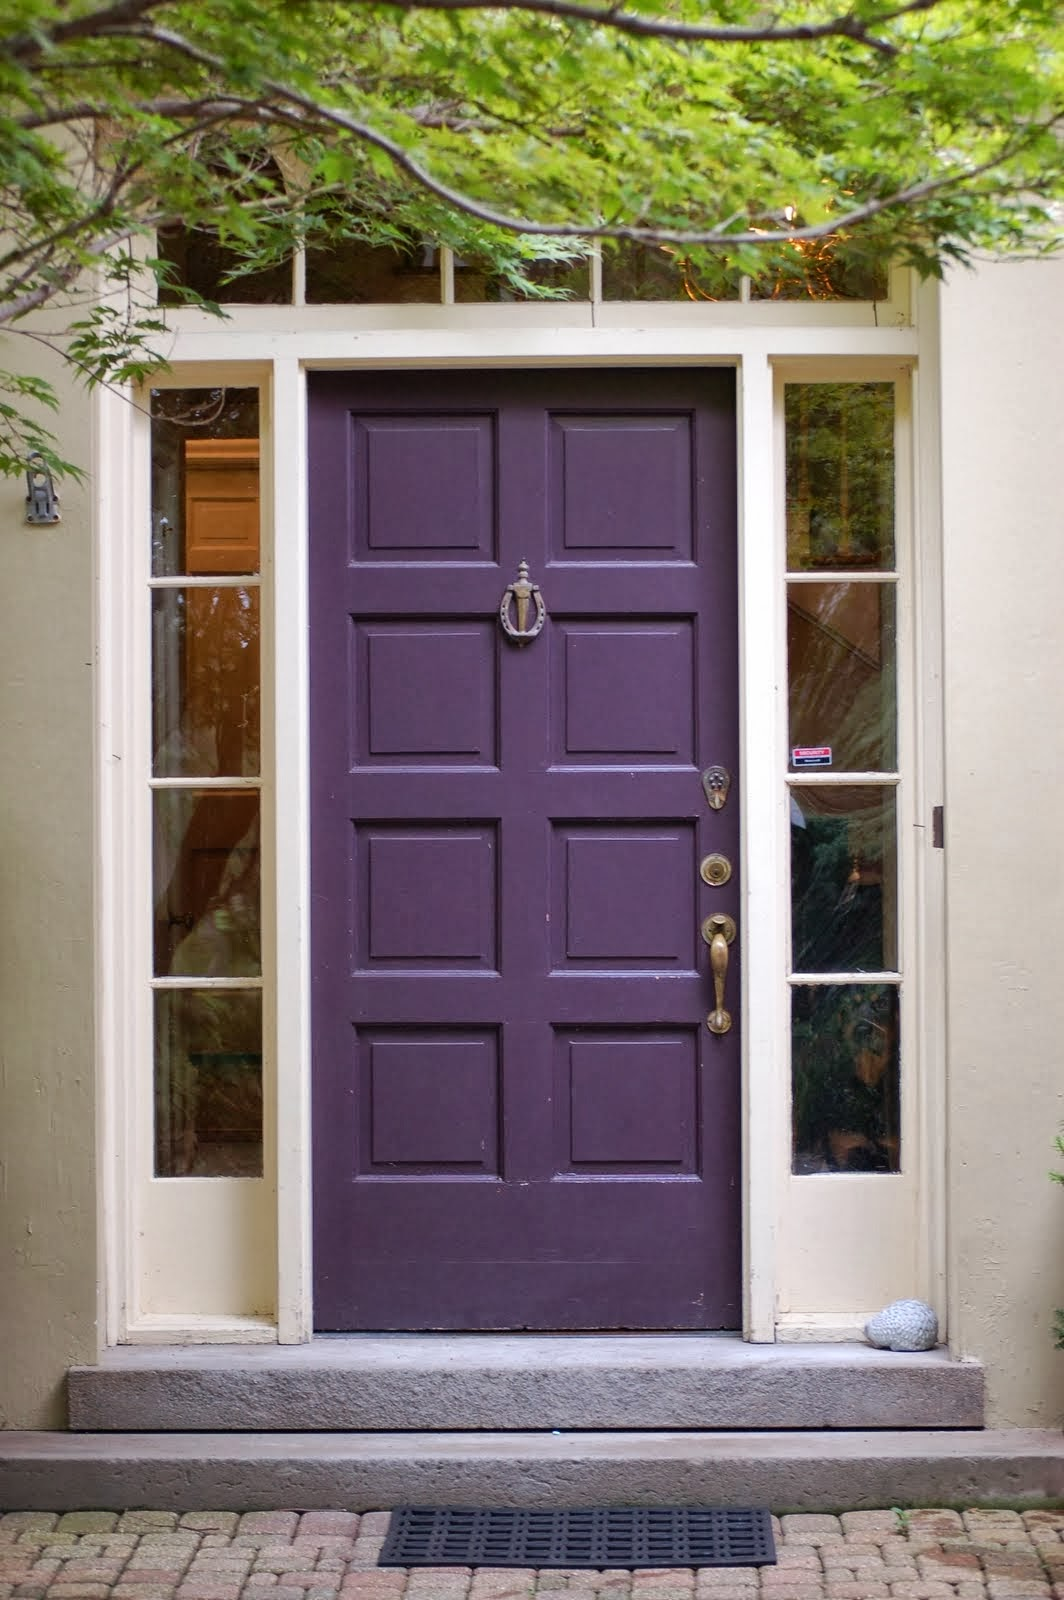 Alejandra Creatini: Decorating with Color - Front Door ... on Door Color Ideas  id=30887